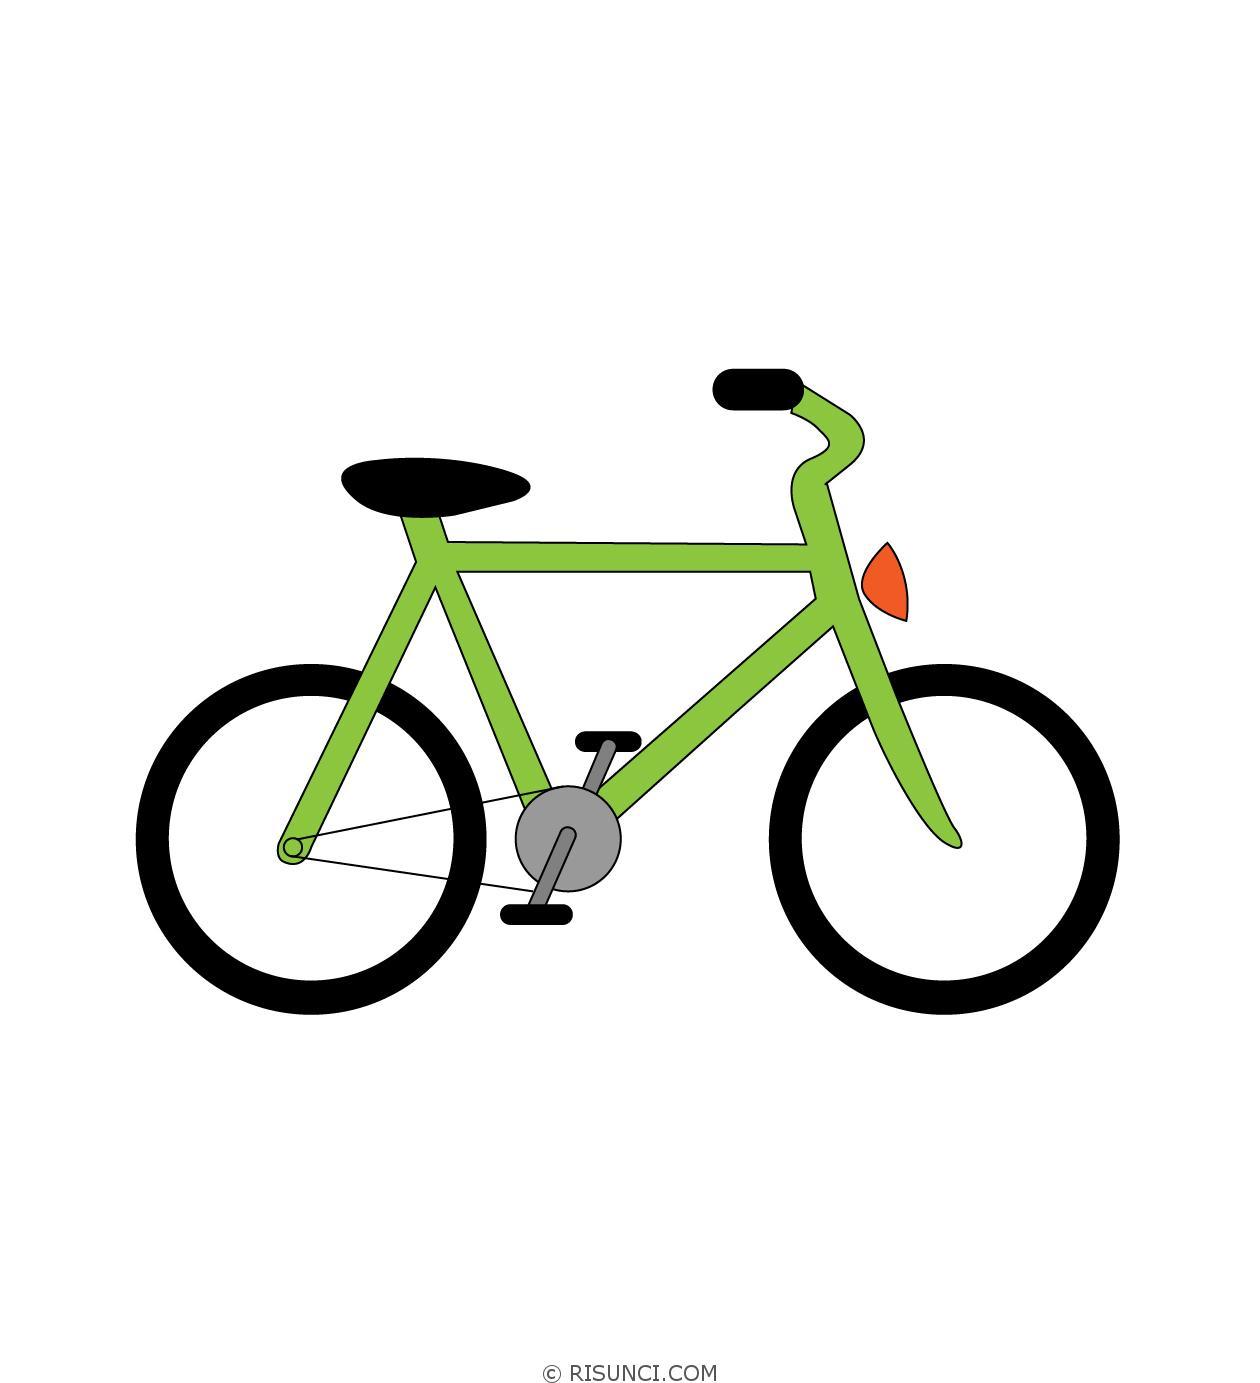 картинки велосипедиста карандашом поэтапно эти